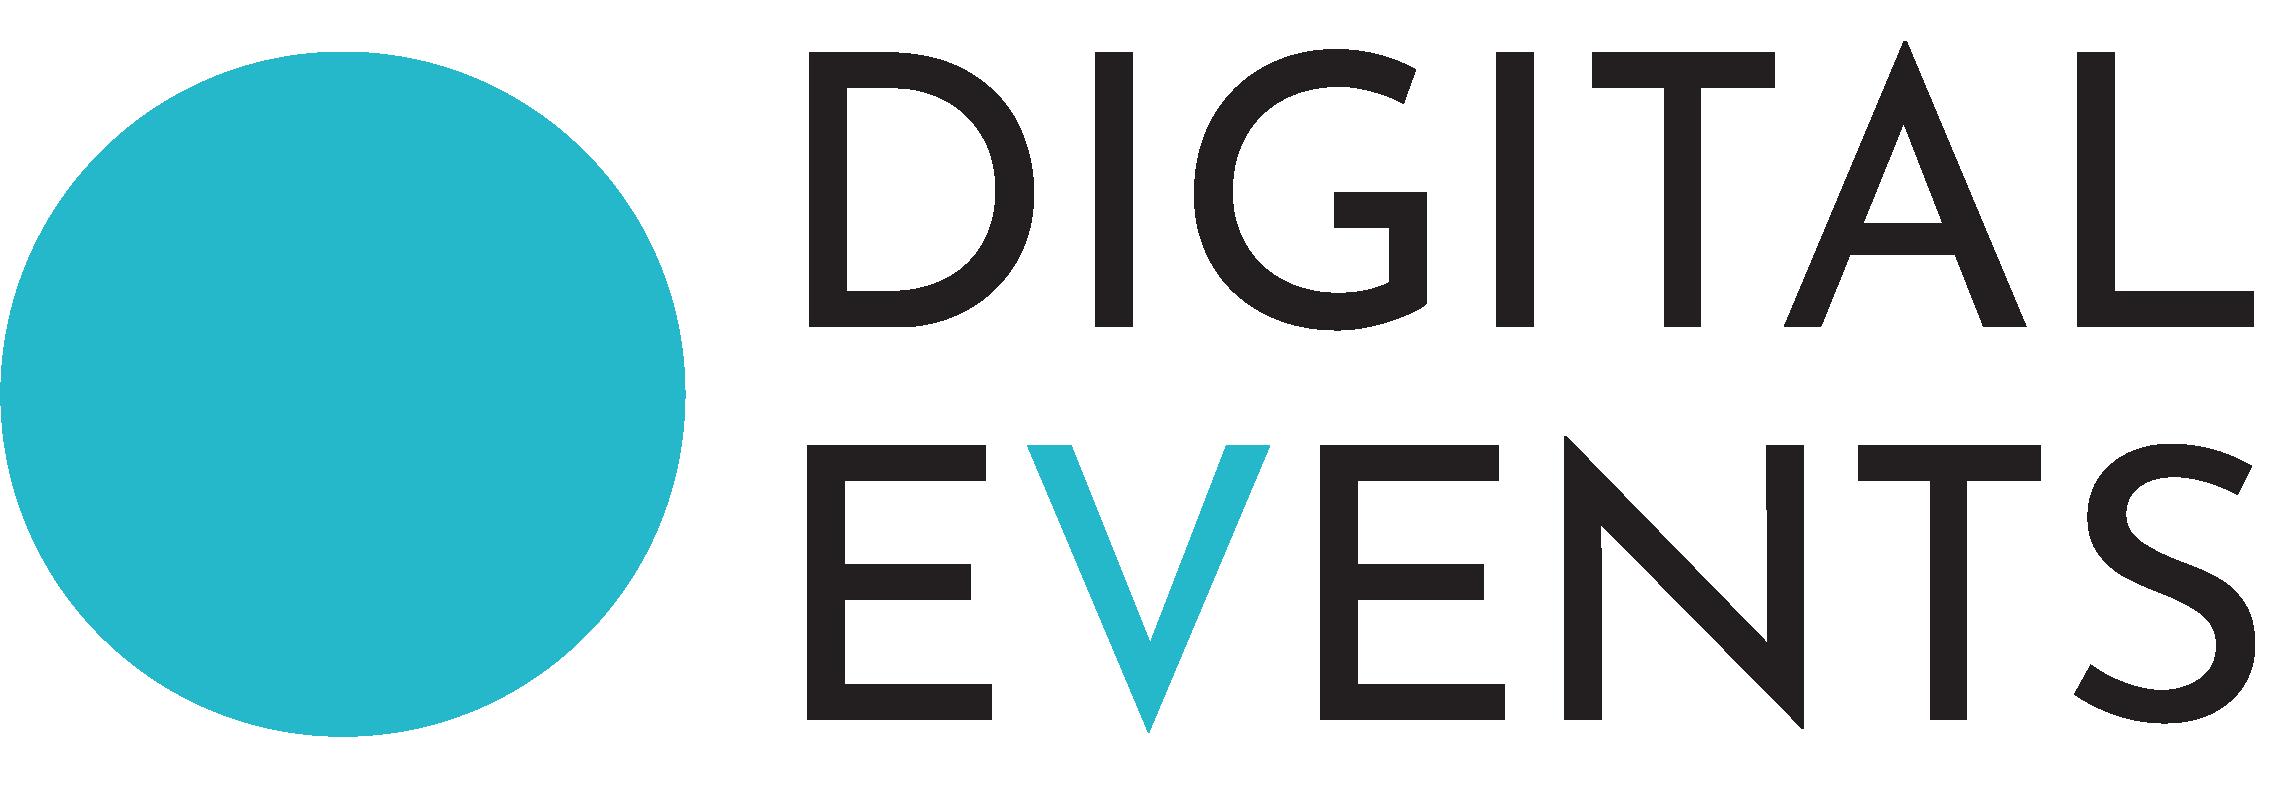 Digital Events Logo Black